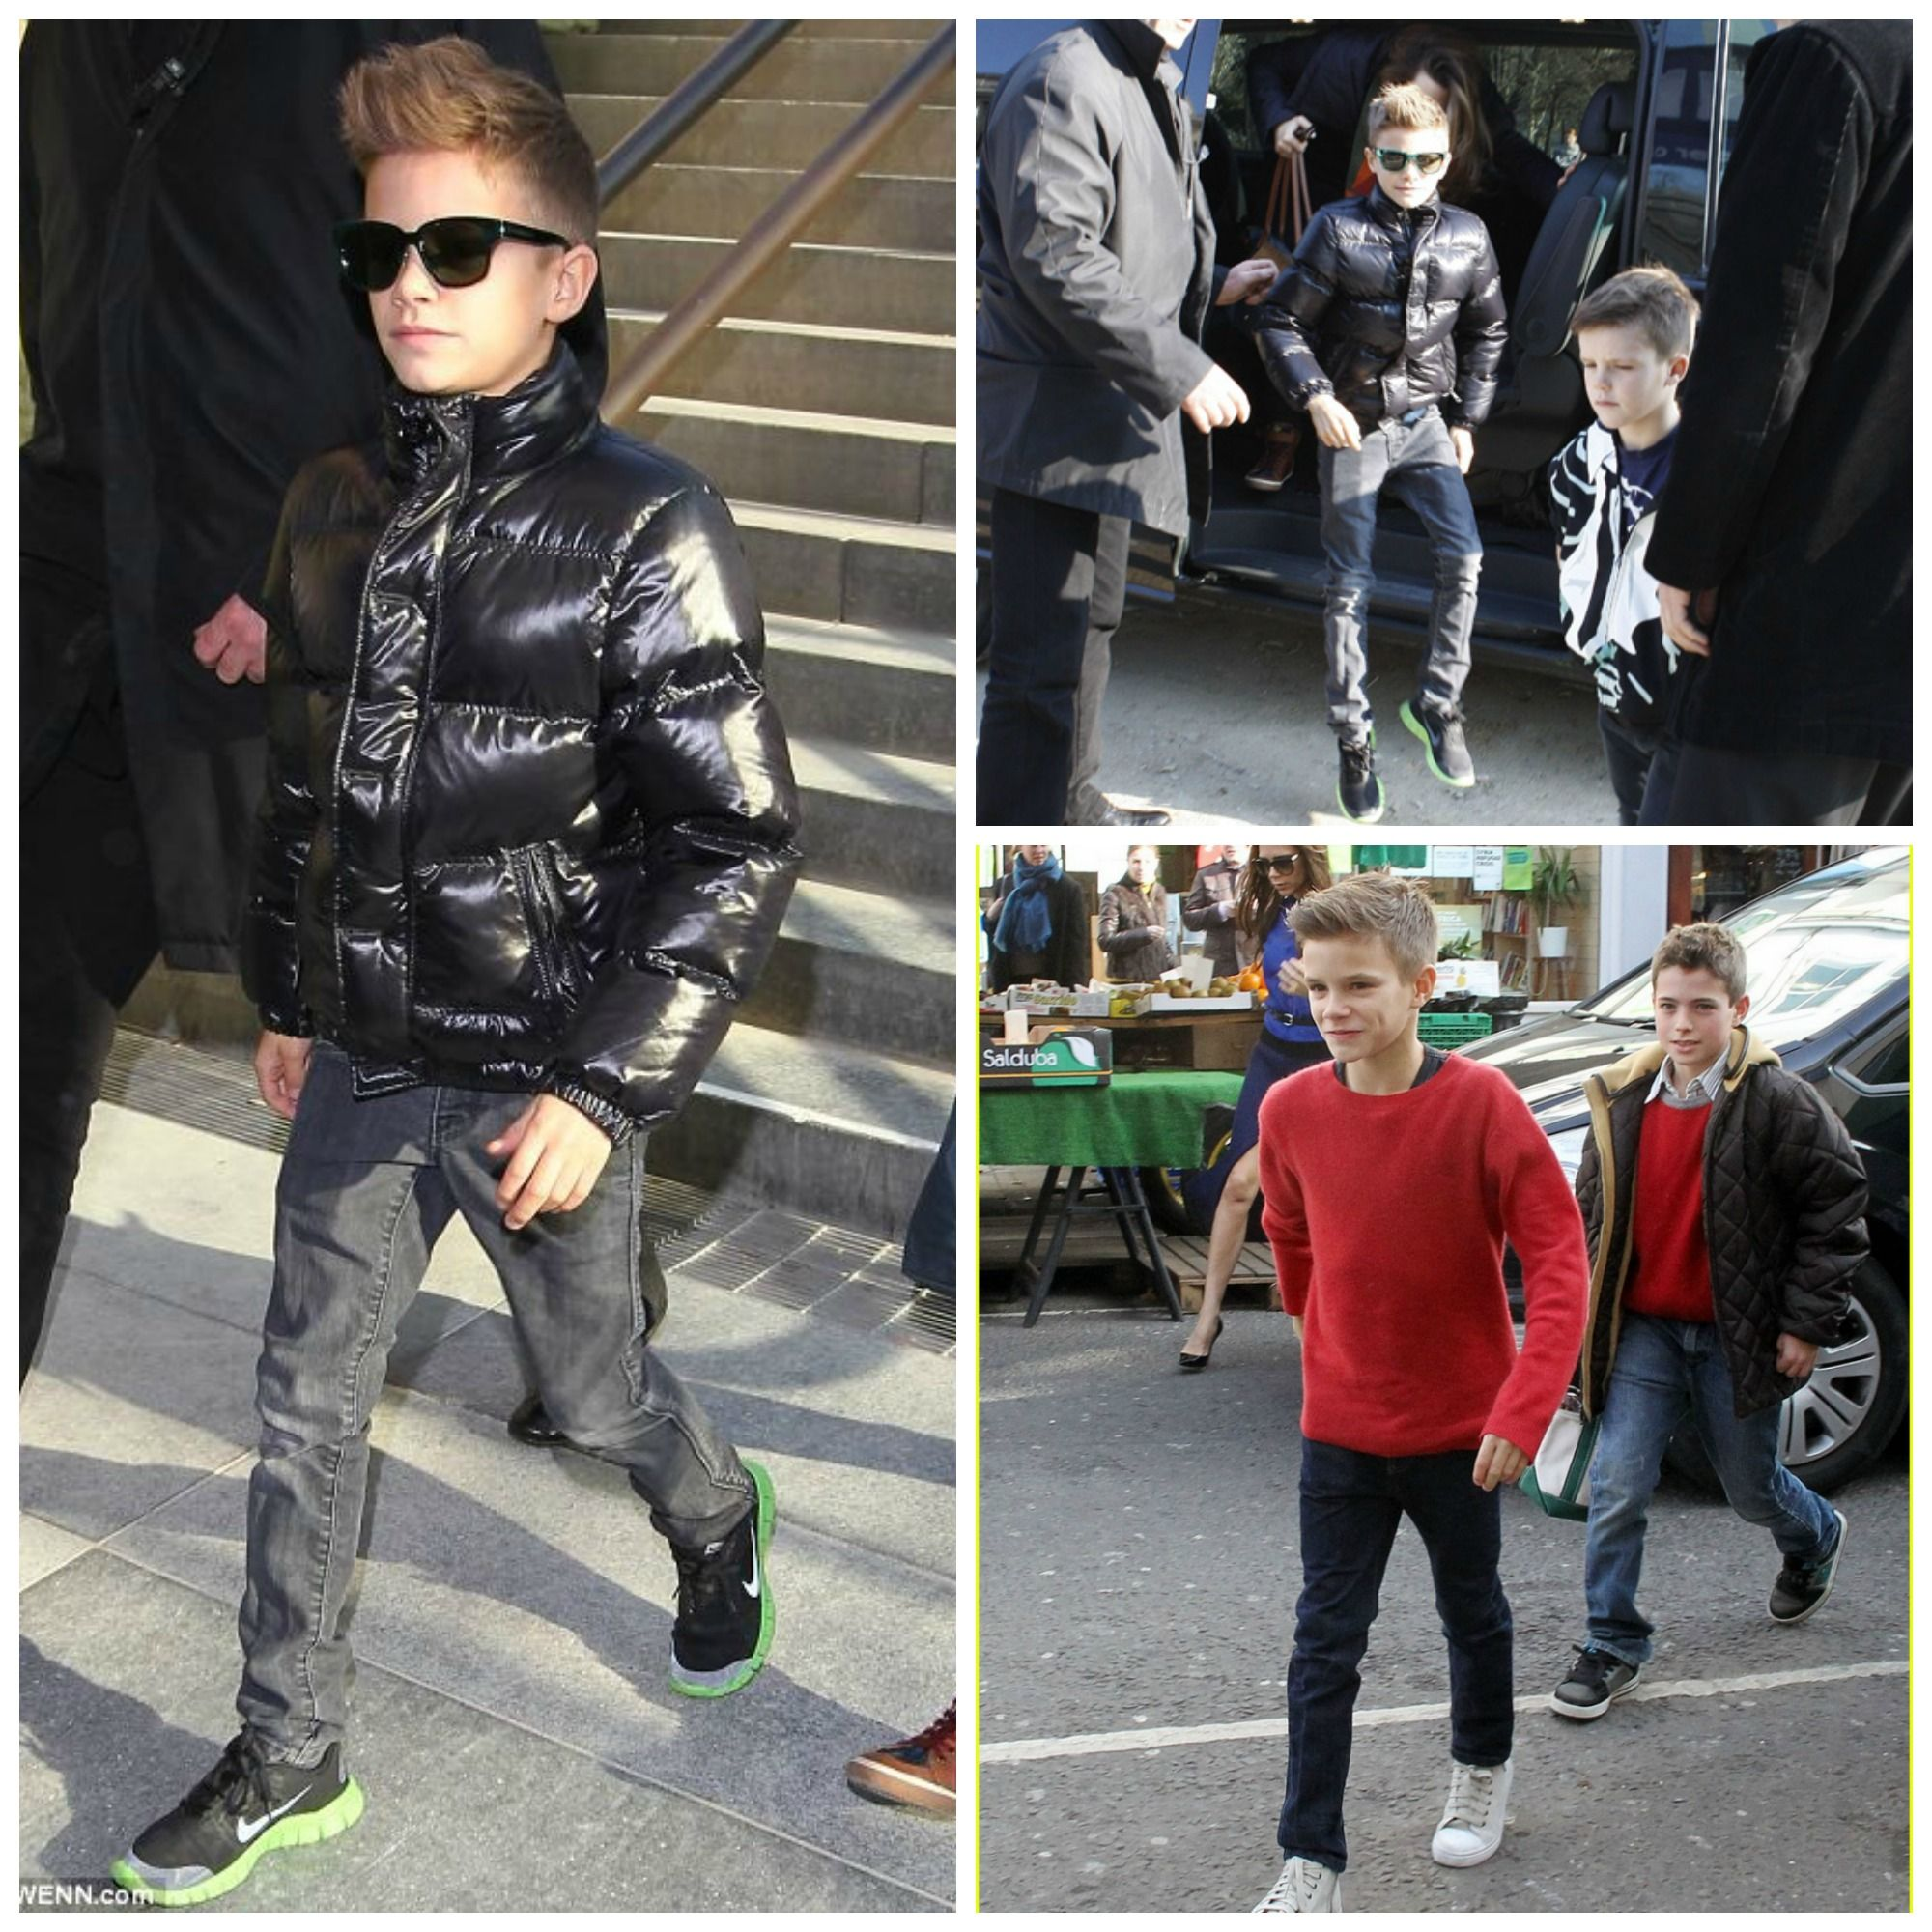 Romeo beckham#kids #fashion #boys